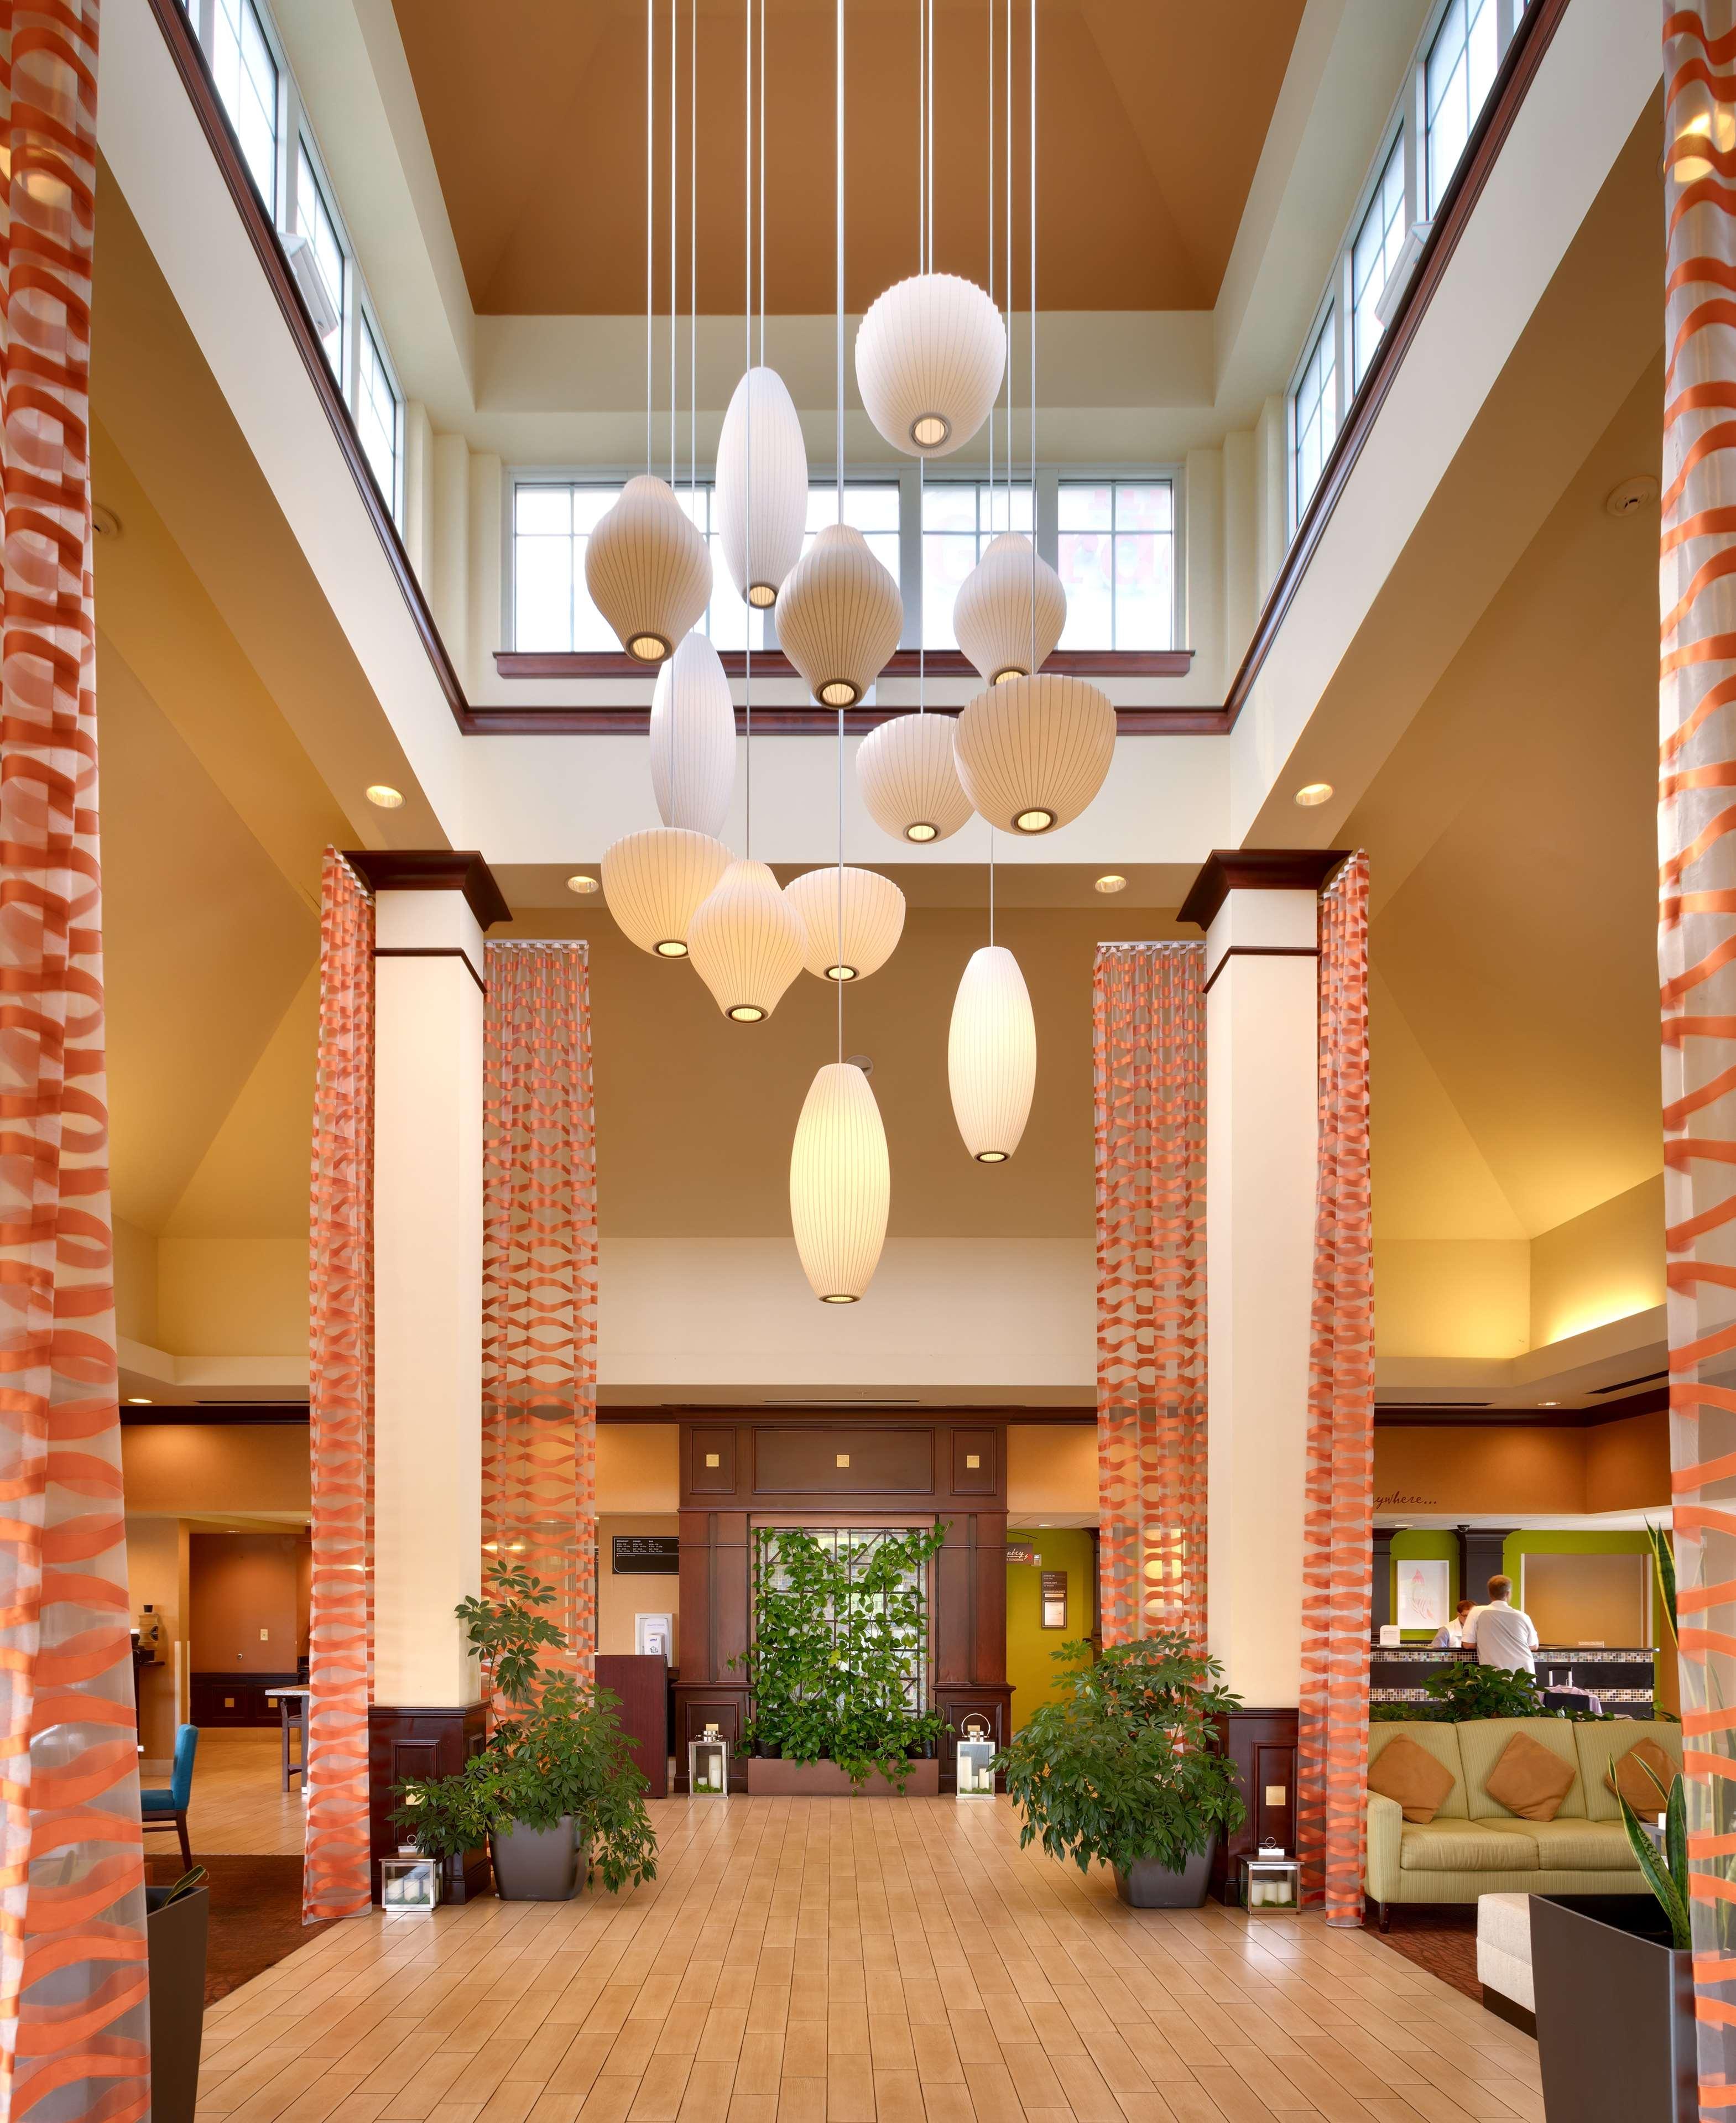 Hilton Garden Inn Clarksville image 9